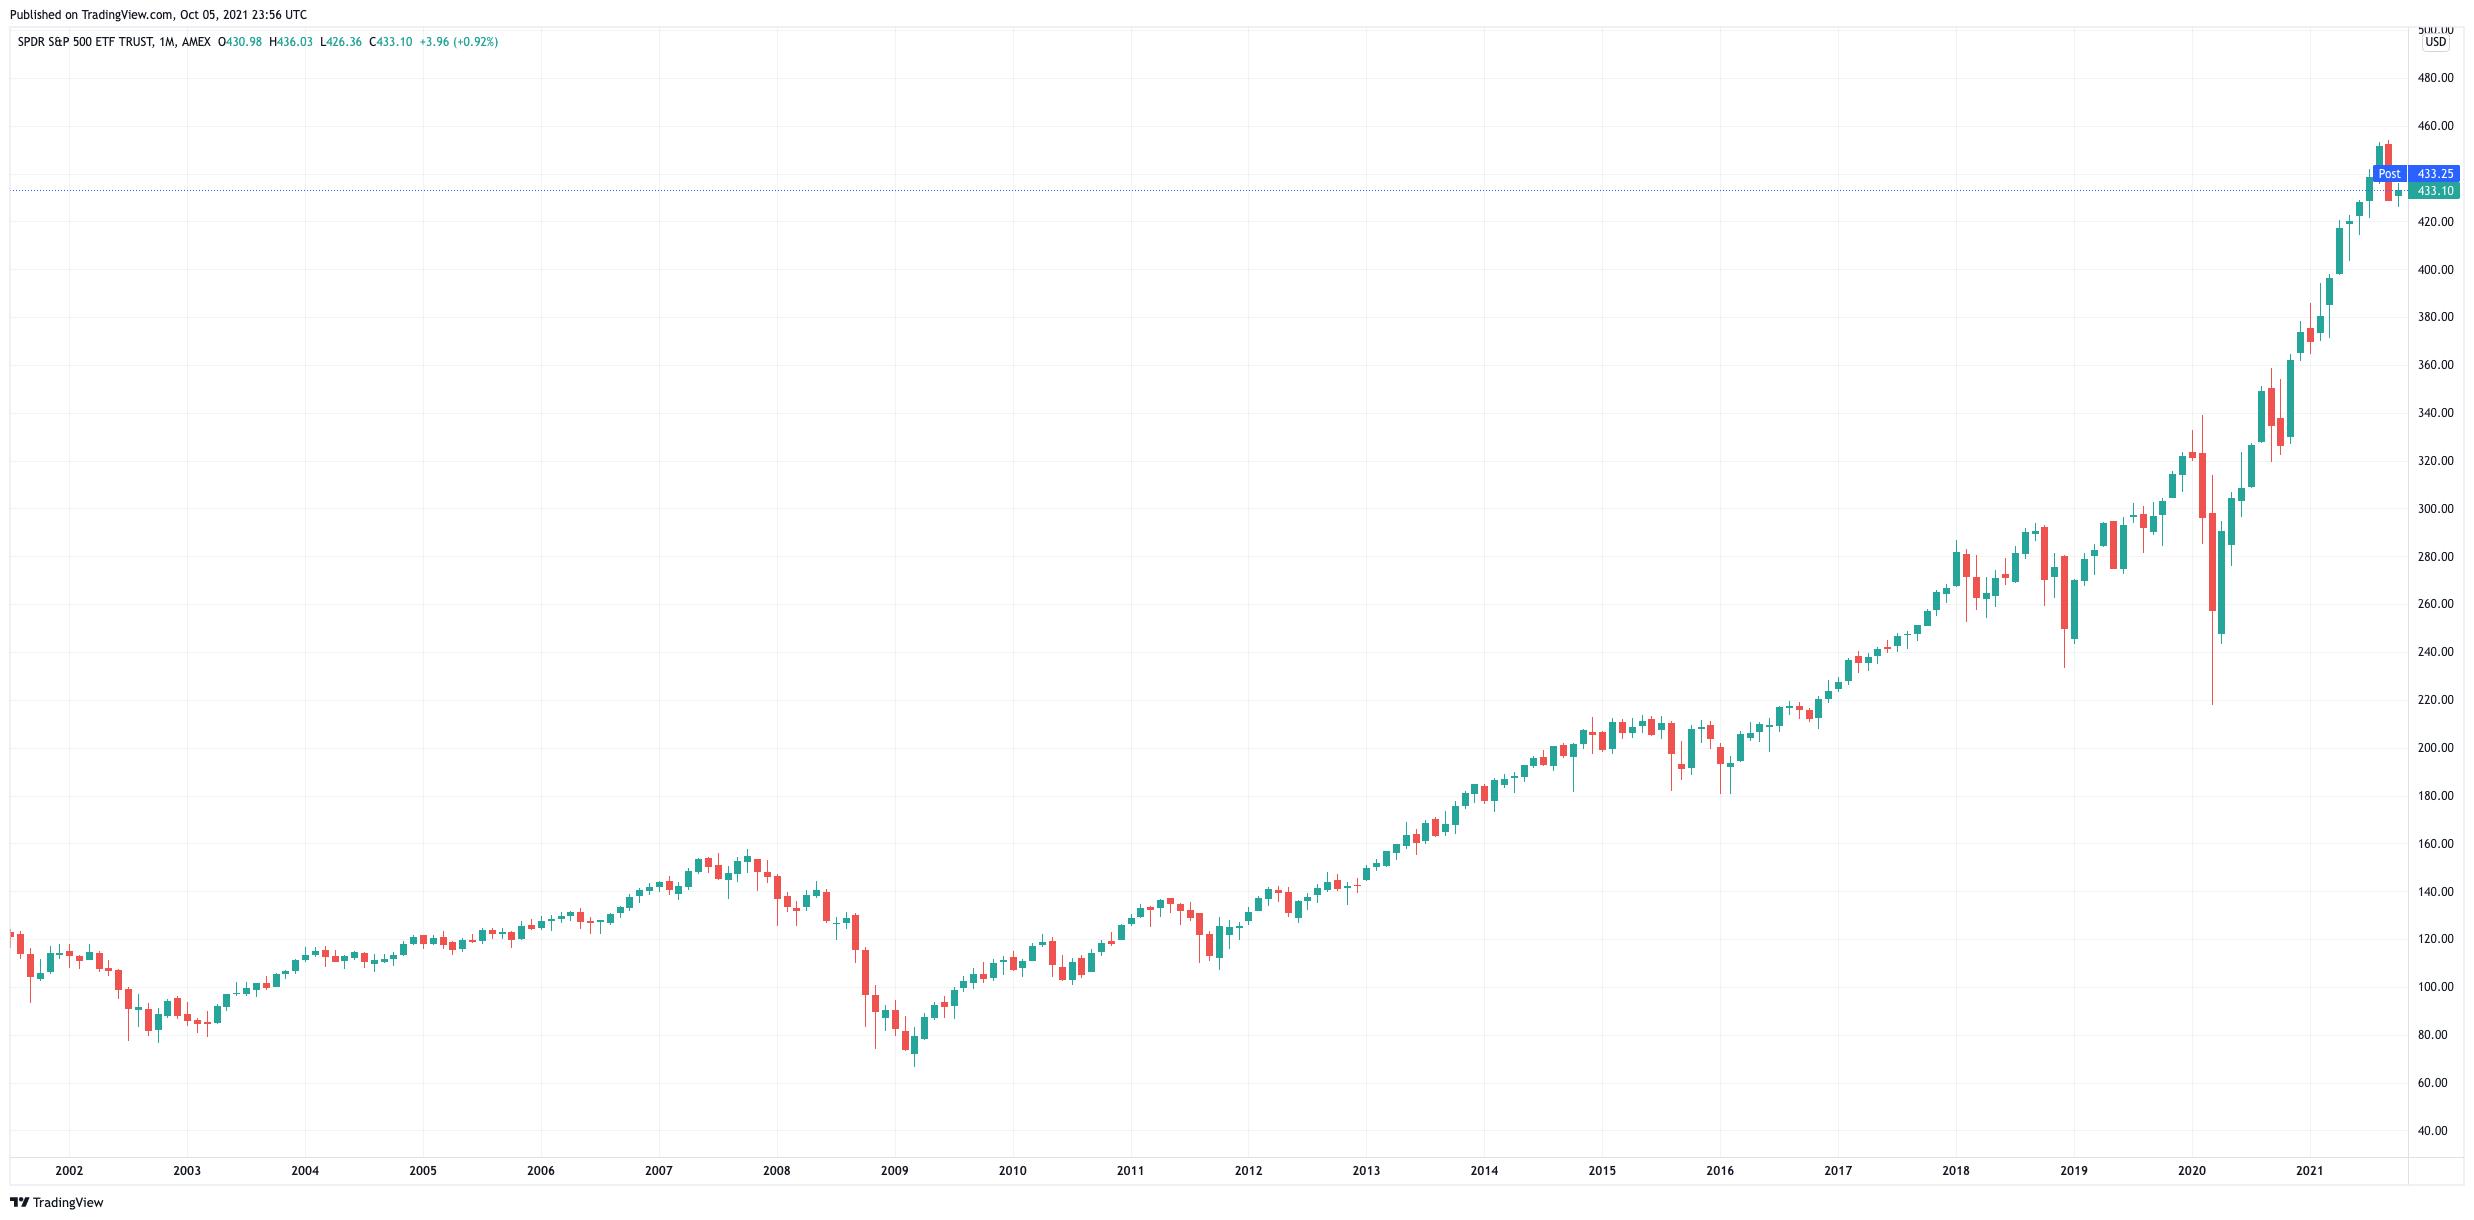 SPY ETF price chart